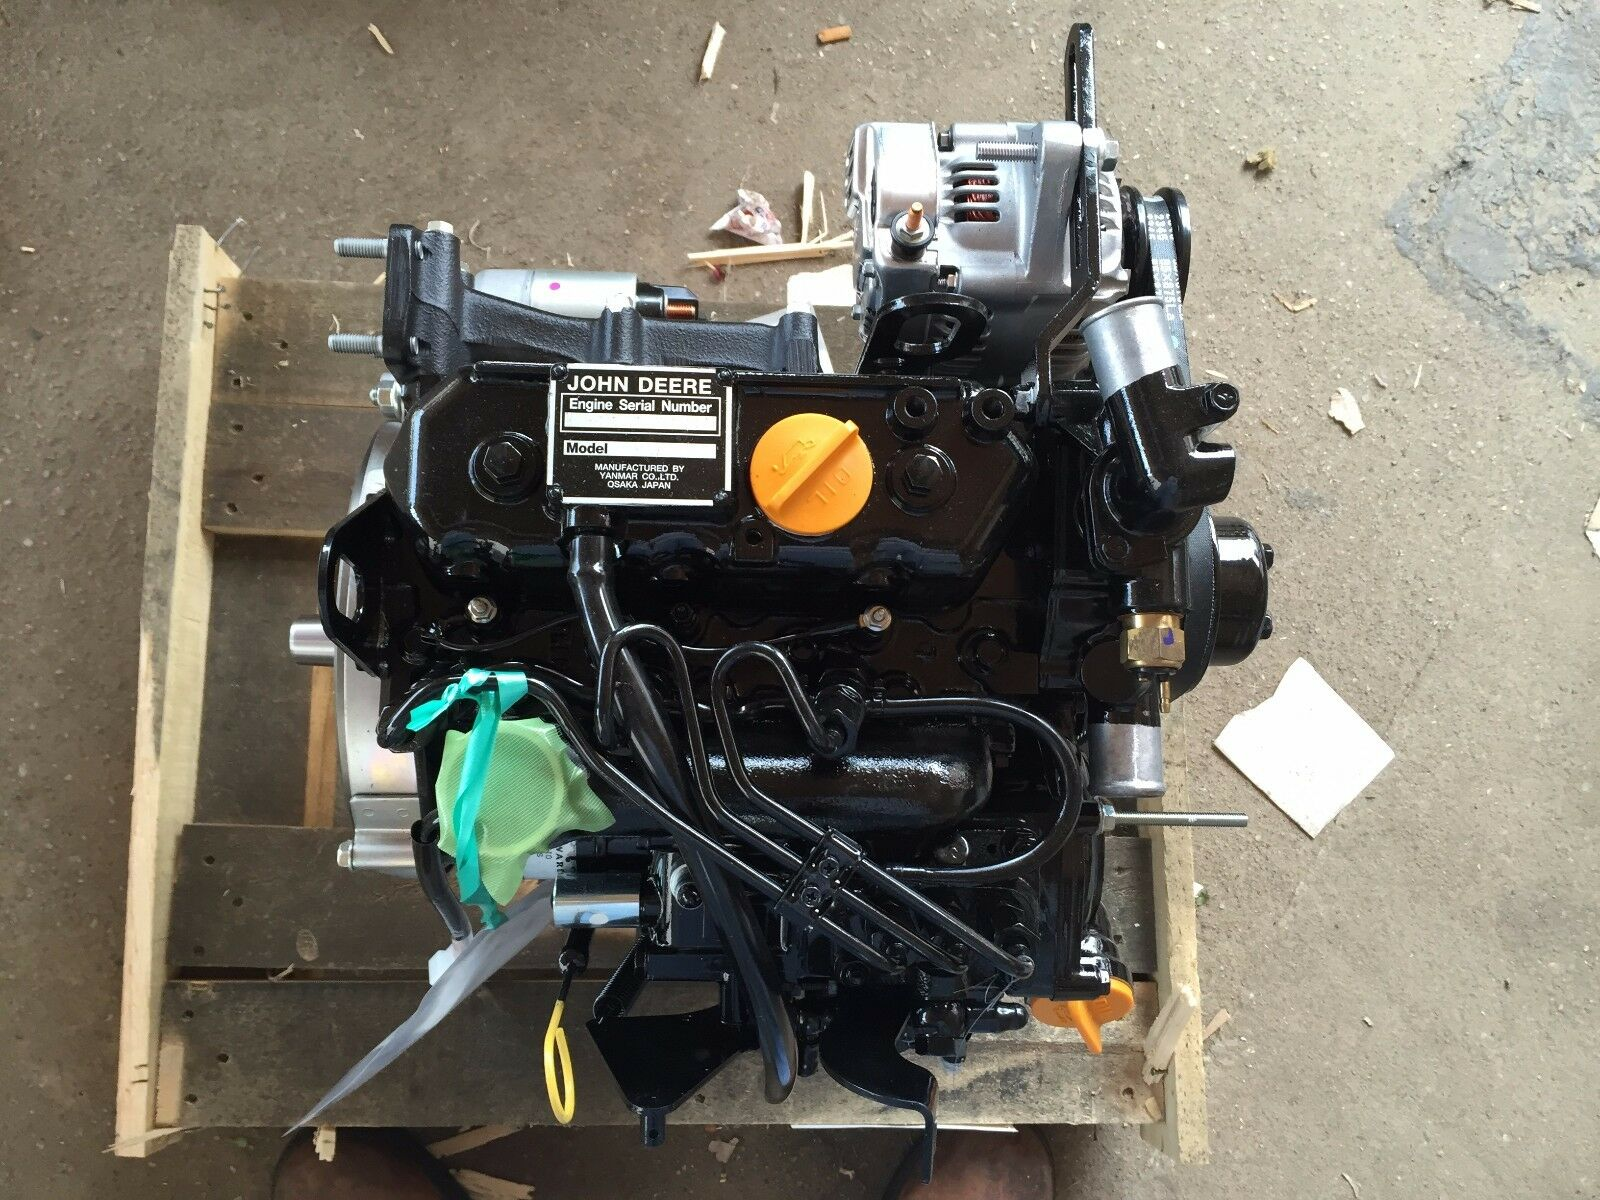 s l1600 john deere engine ebay  at reclaimingppi.co